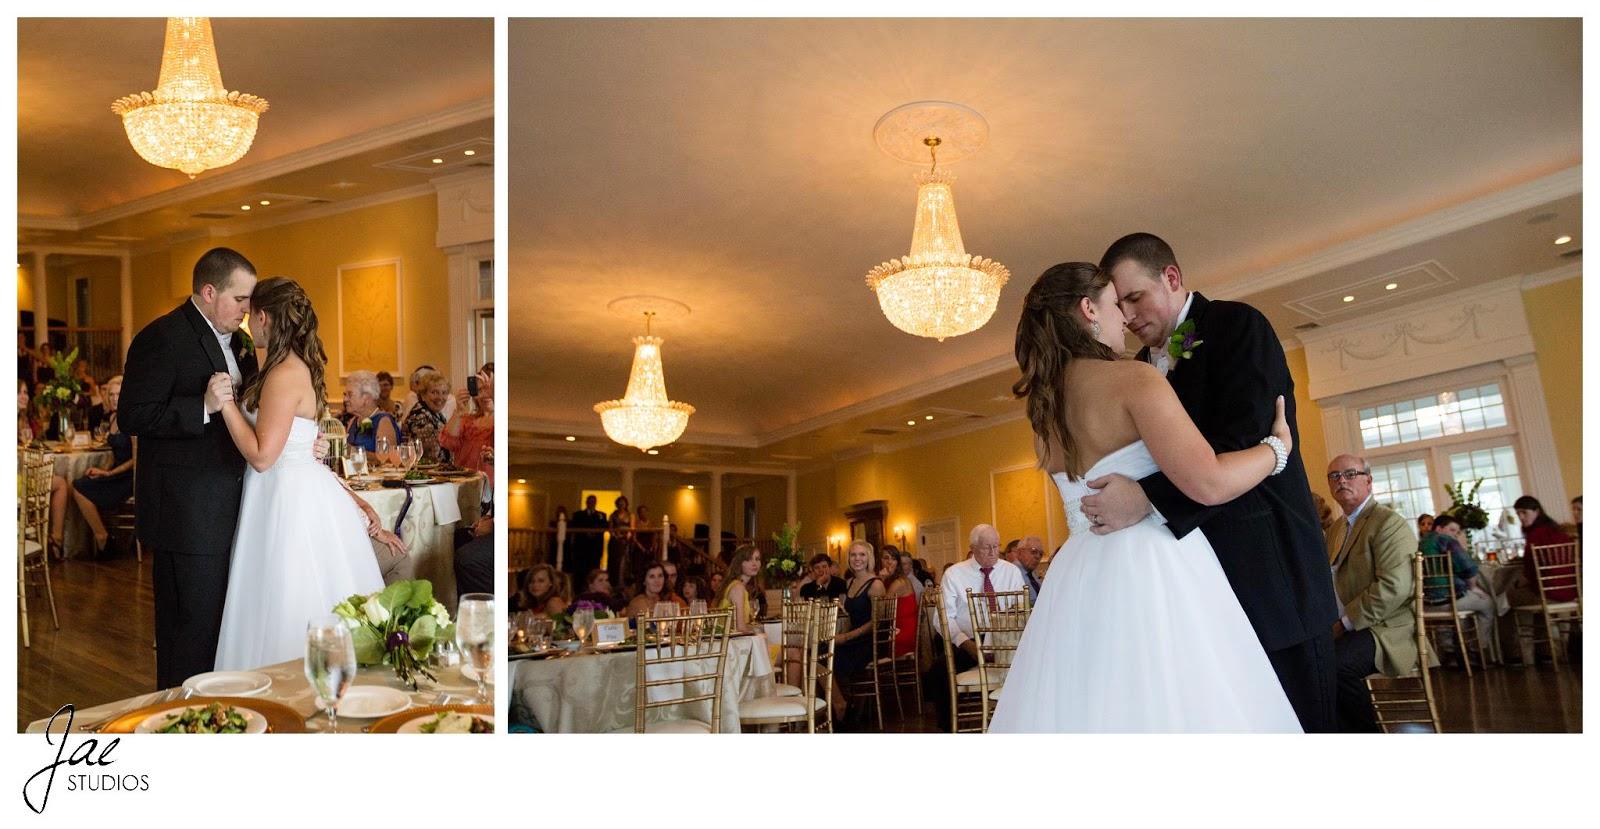 Jonathan and Julie, Bird cage, West Manor Estate, Wedding, Lynchburg, Virginia, Jae Studios, wedding dress, chandelier, dancing, tuxedo, purple, tables, guests